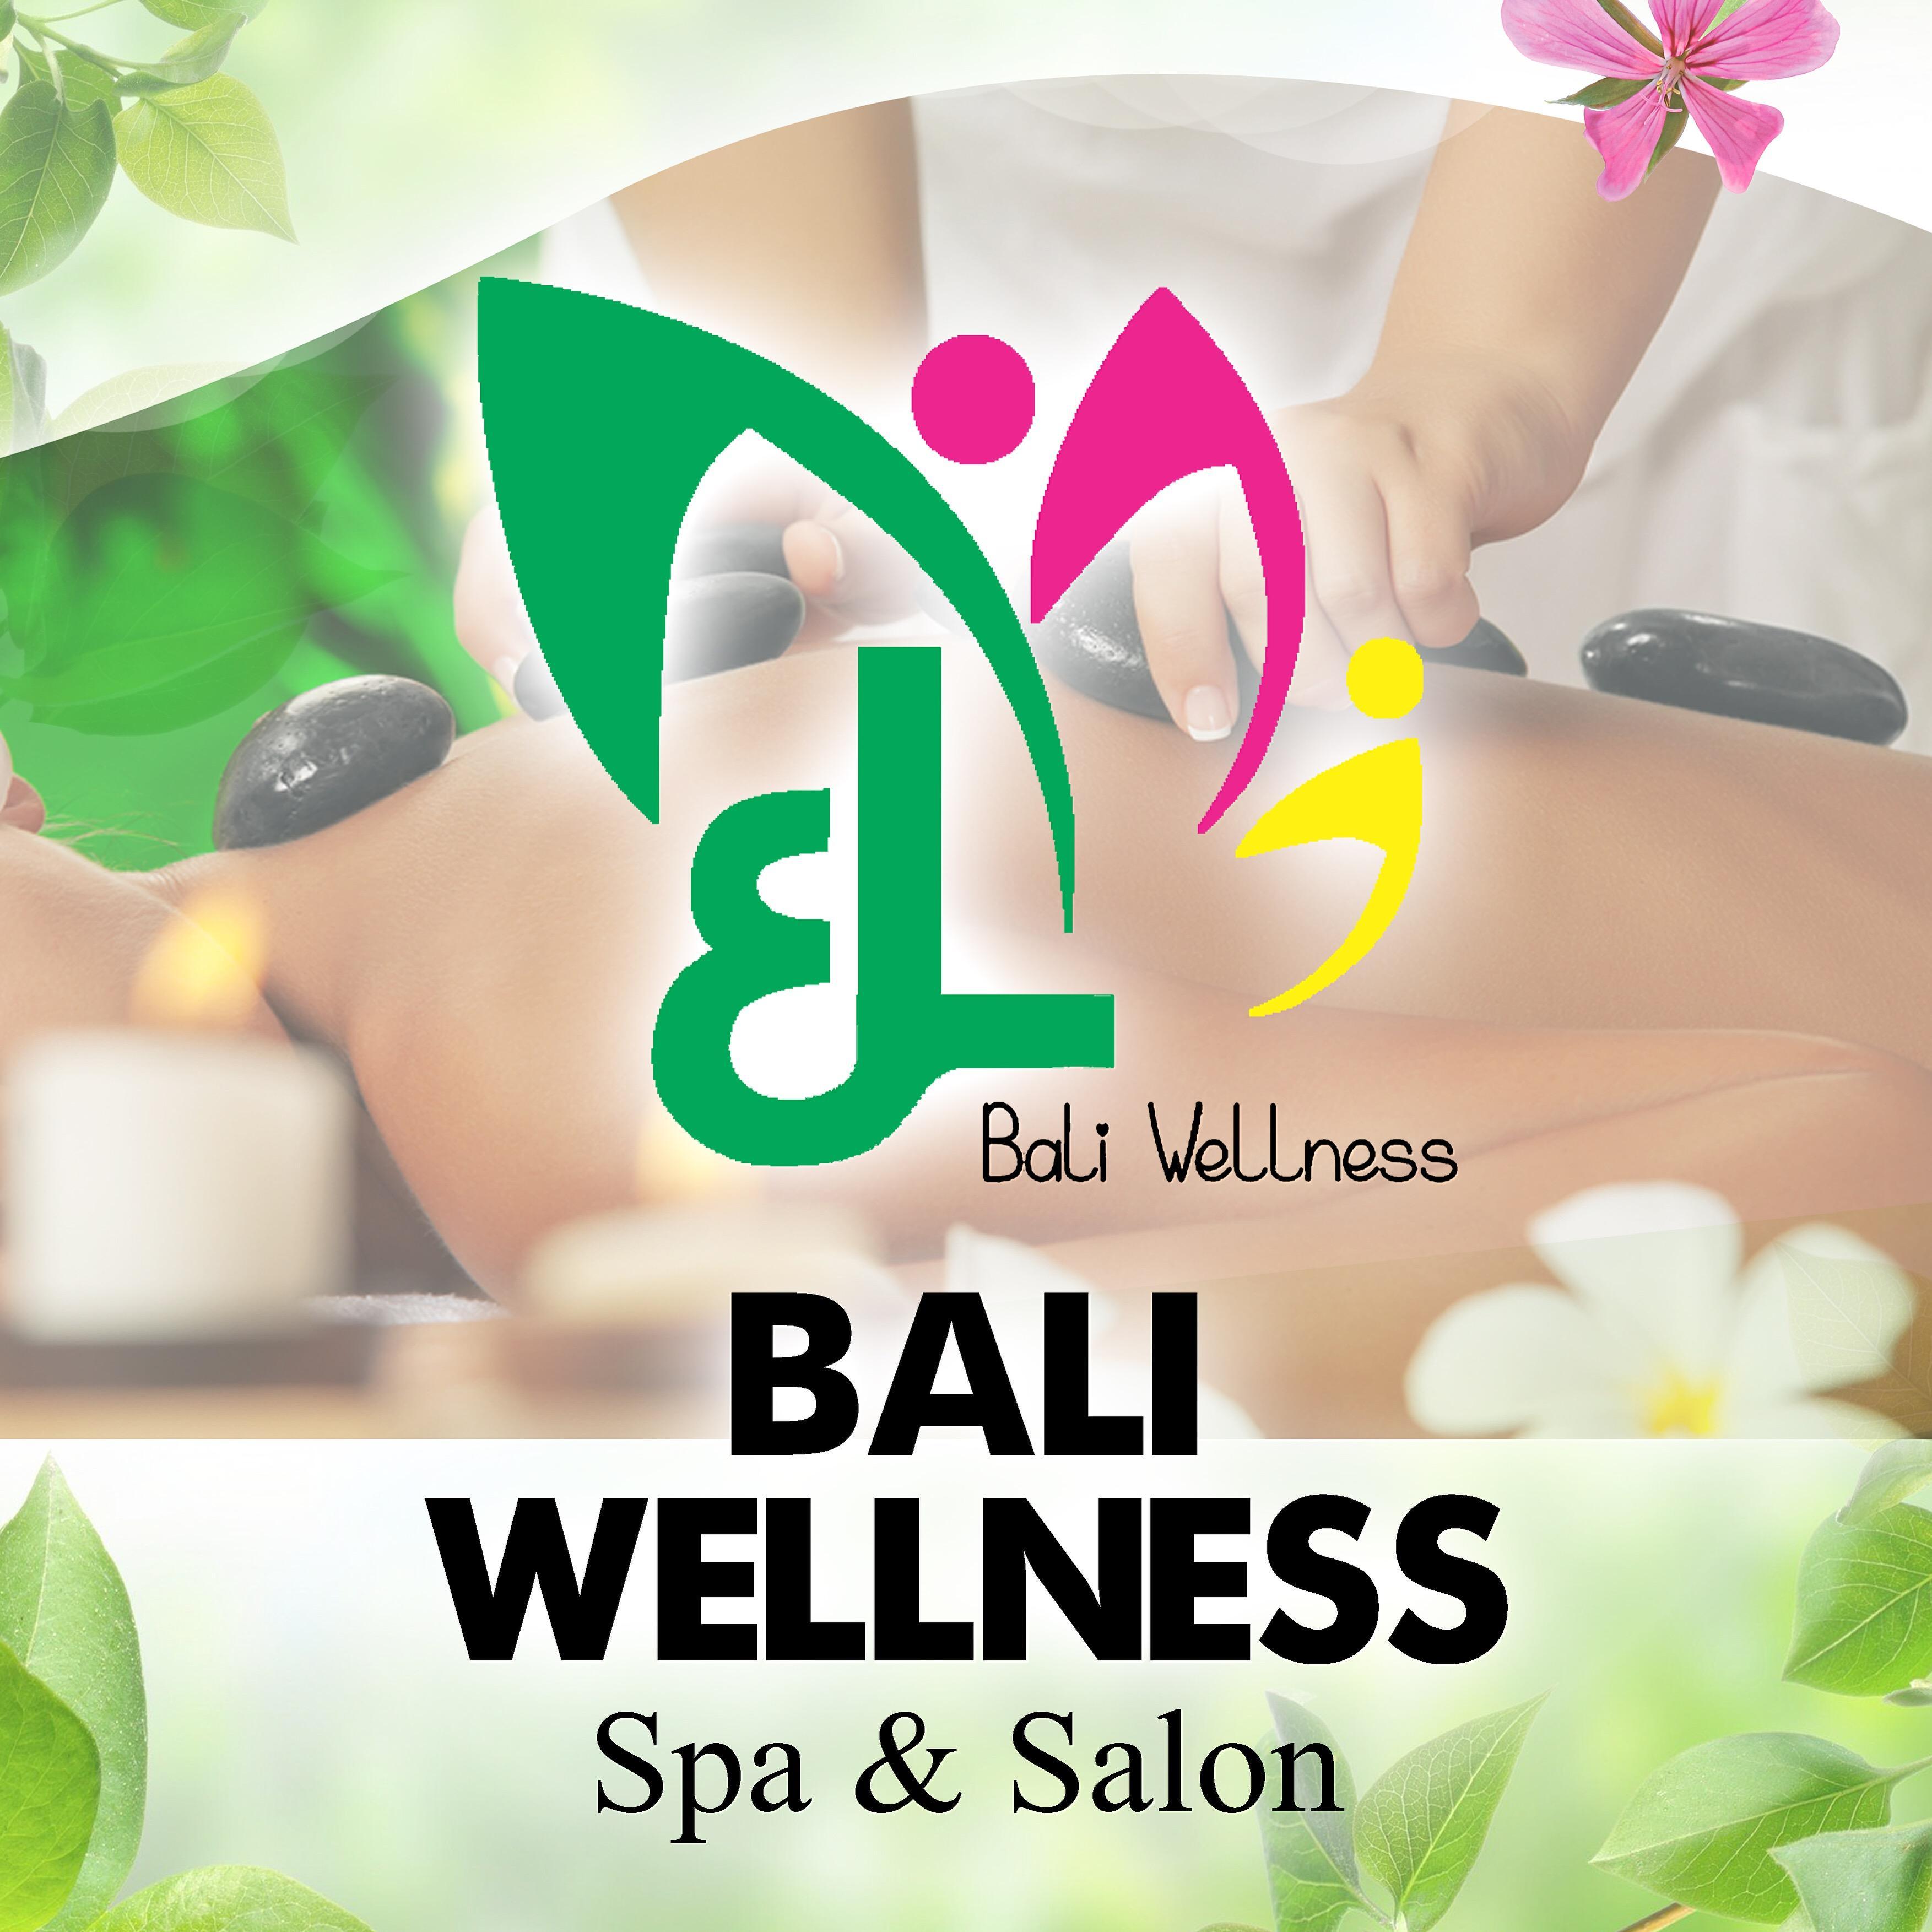 EL Bali Wellness Spa